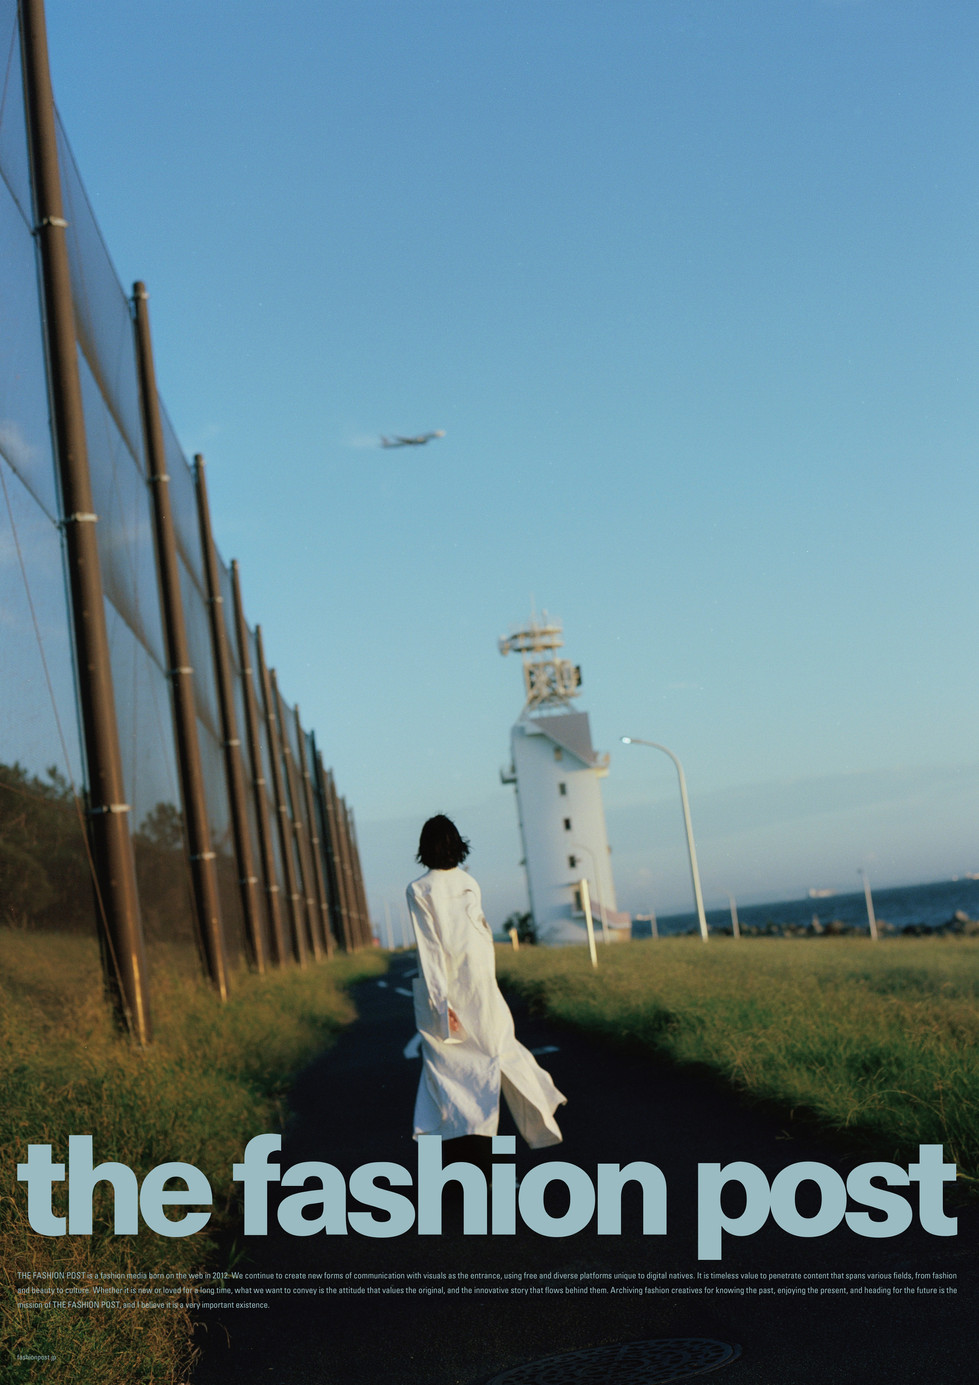 b-thefashionpost-poster-C-1.jpg